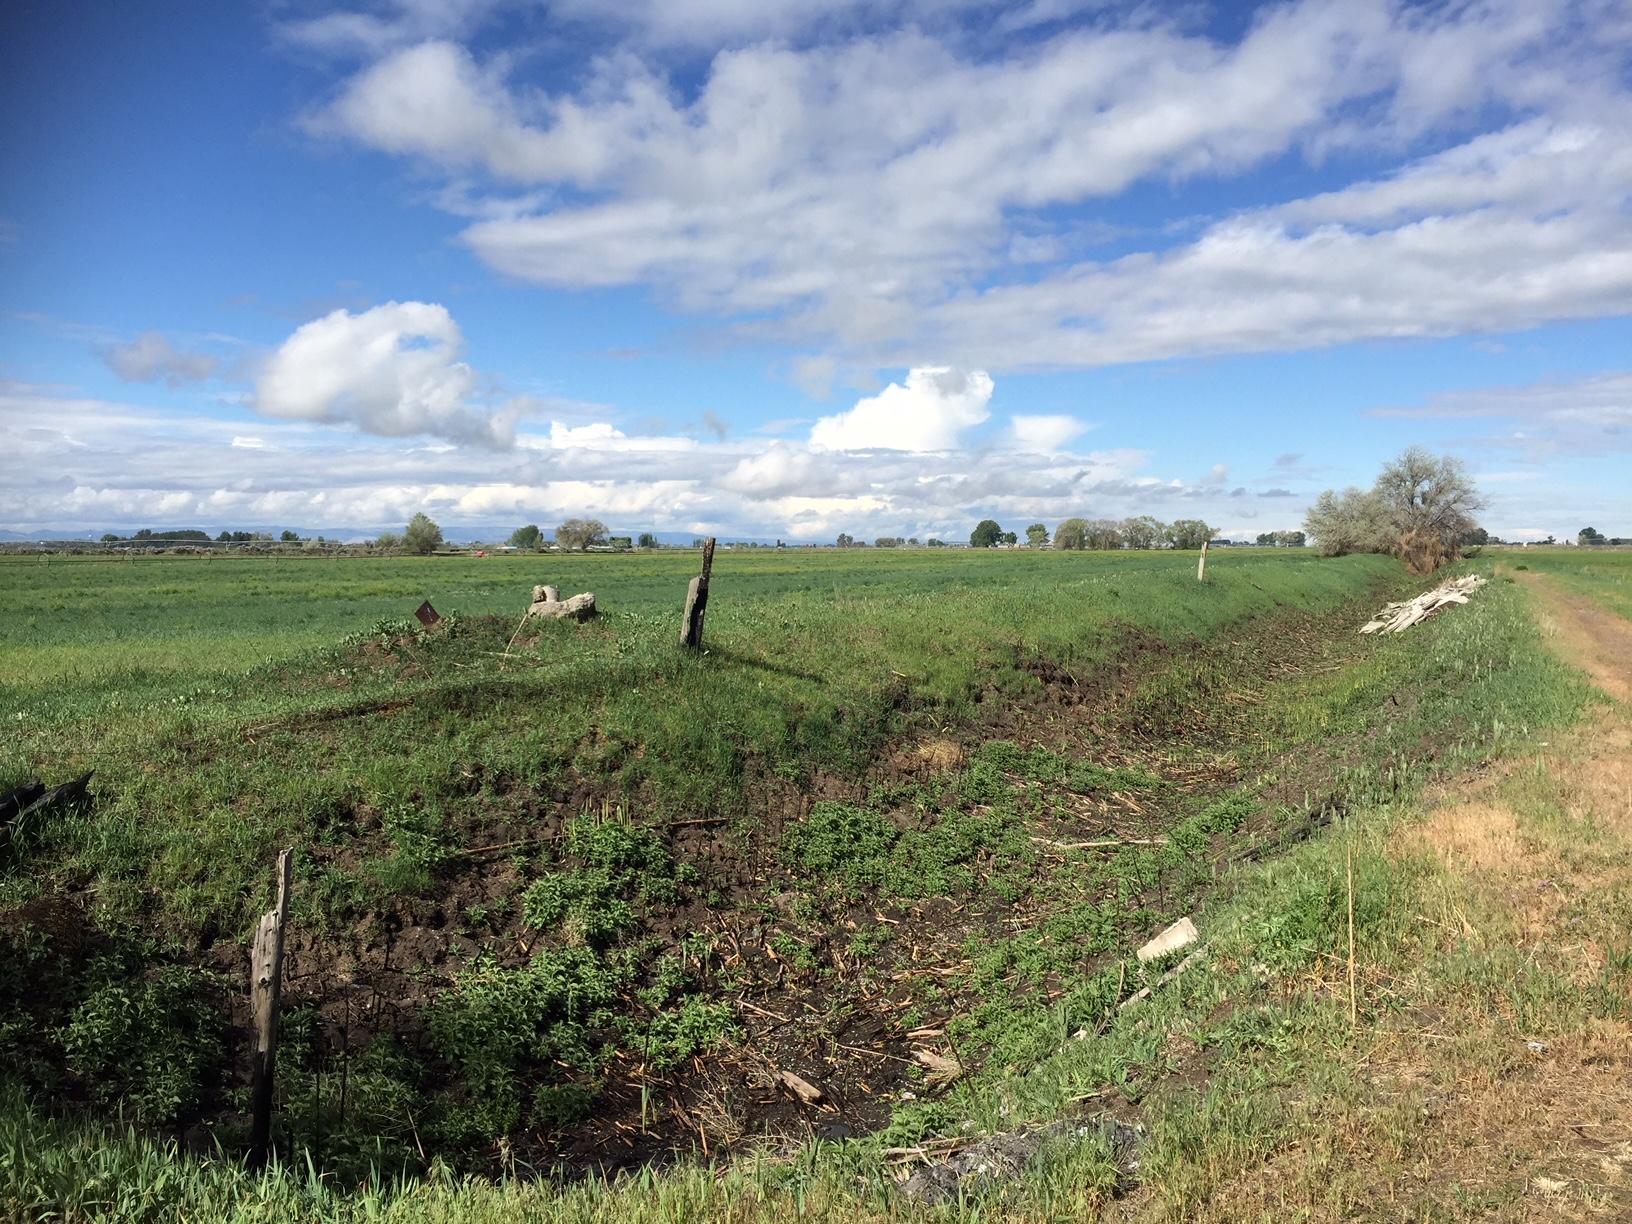 Wild asparagus still grows abundantly along the irrigation ditches.